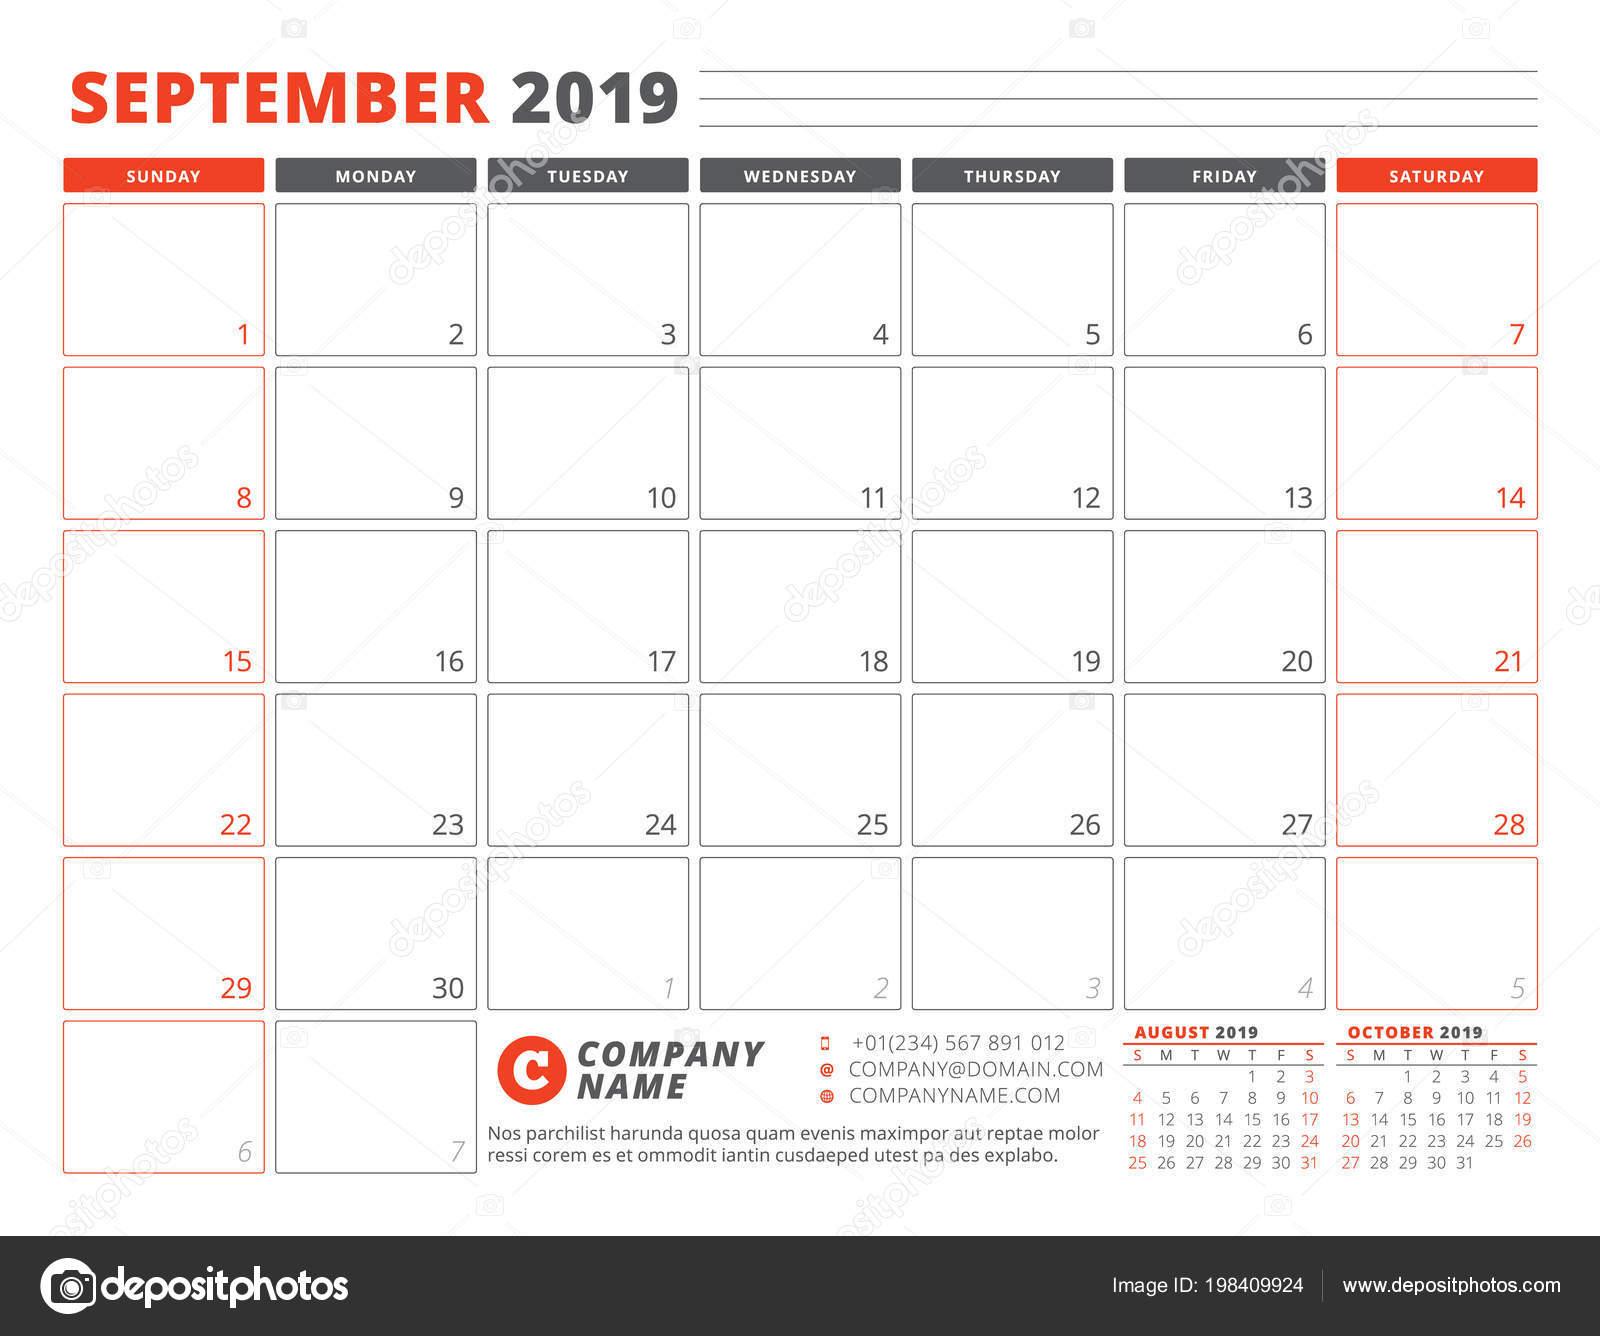 Calendar template september 2019 business planner template calendar template for september 2019 business planner template stationery design week starts on sunday landscape orientation maxwellsz